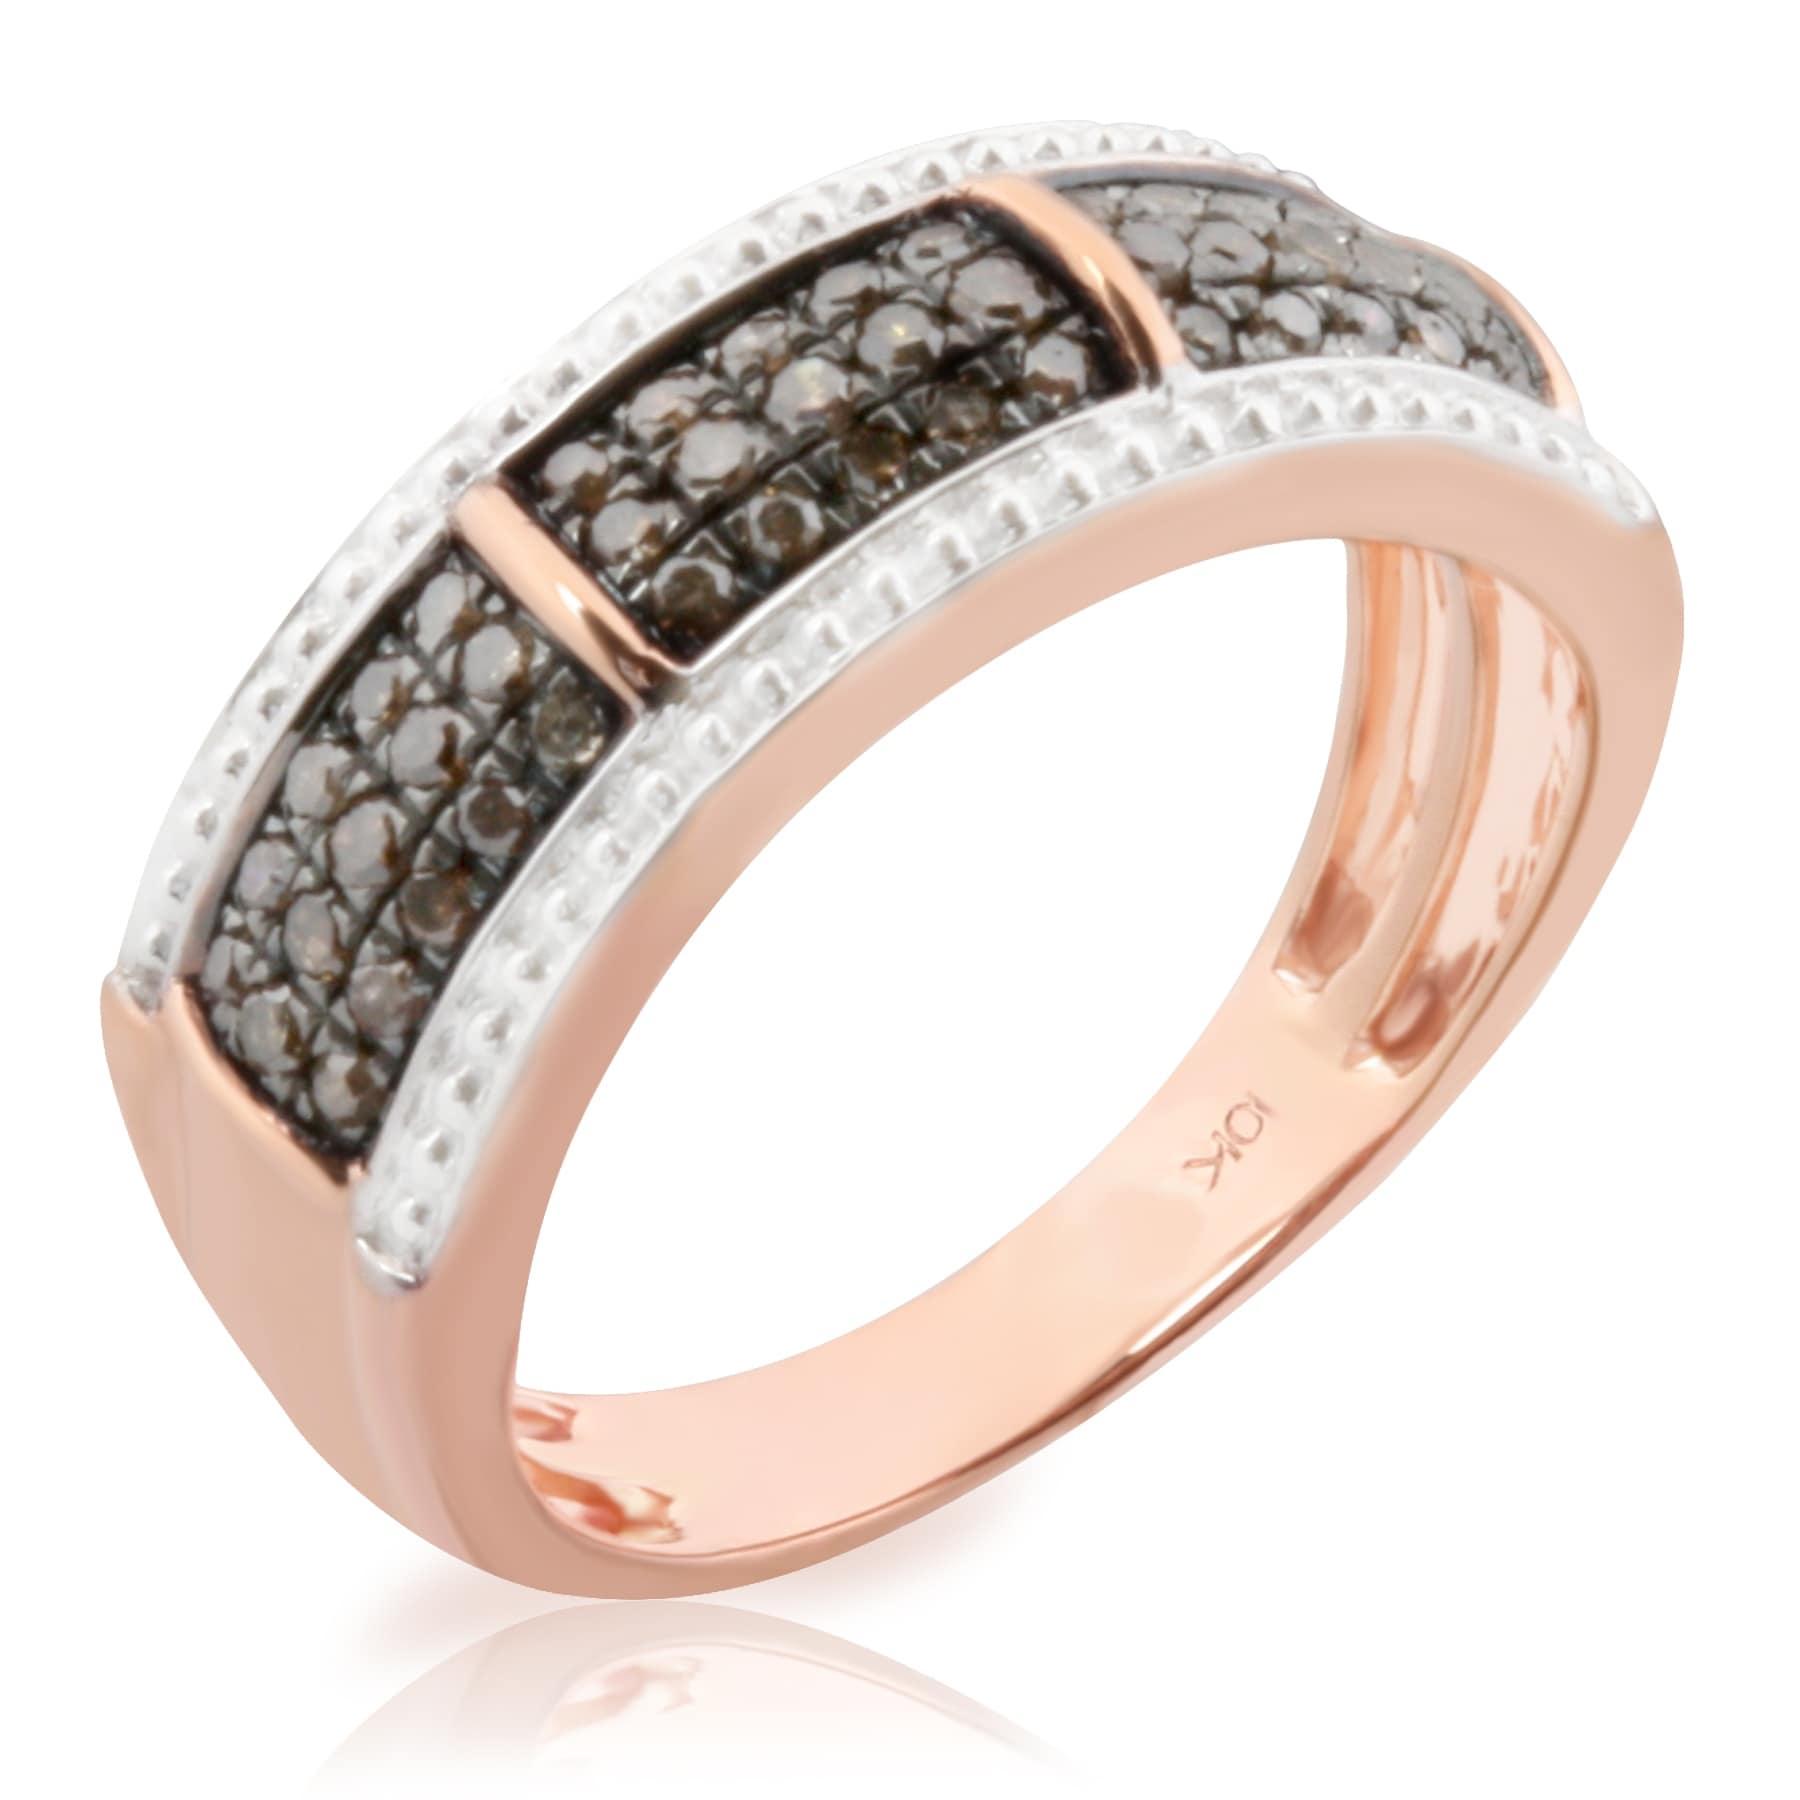 Brand New 0.37 Carat Round Brilliant Cut Real Brown Diamond Anniversary Ring - Thumbnail 0